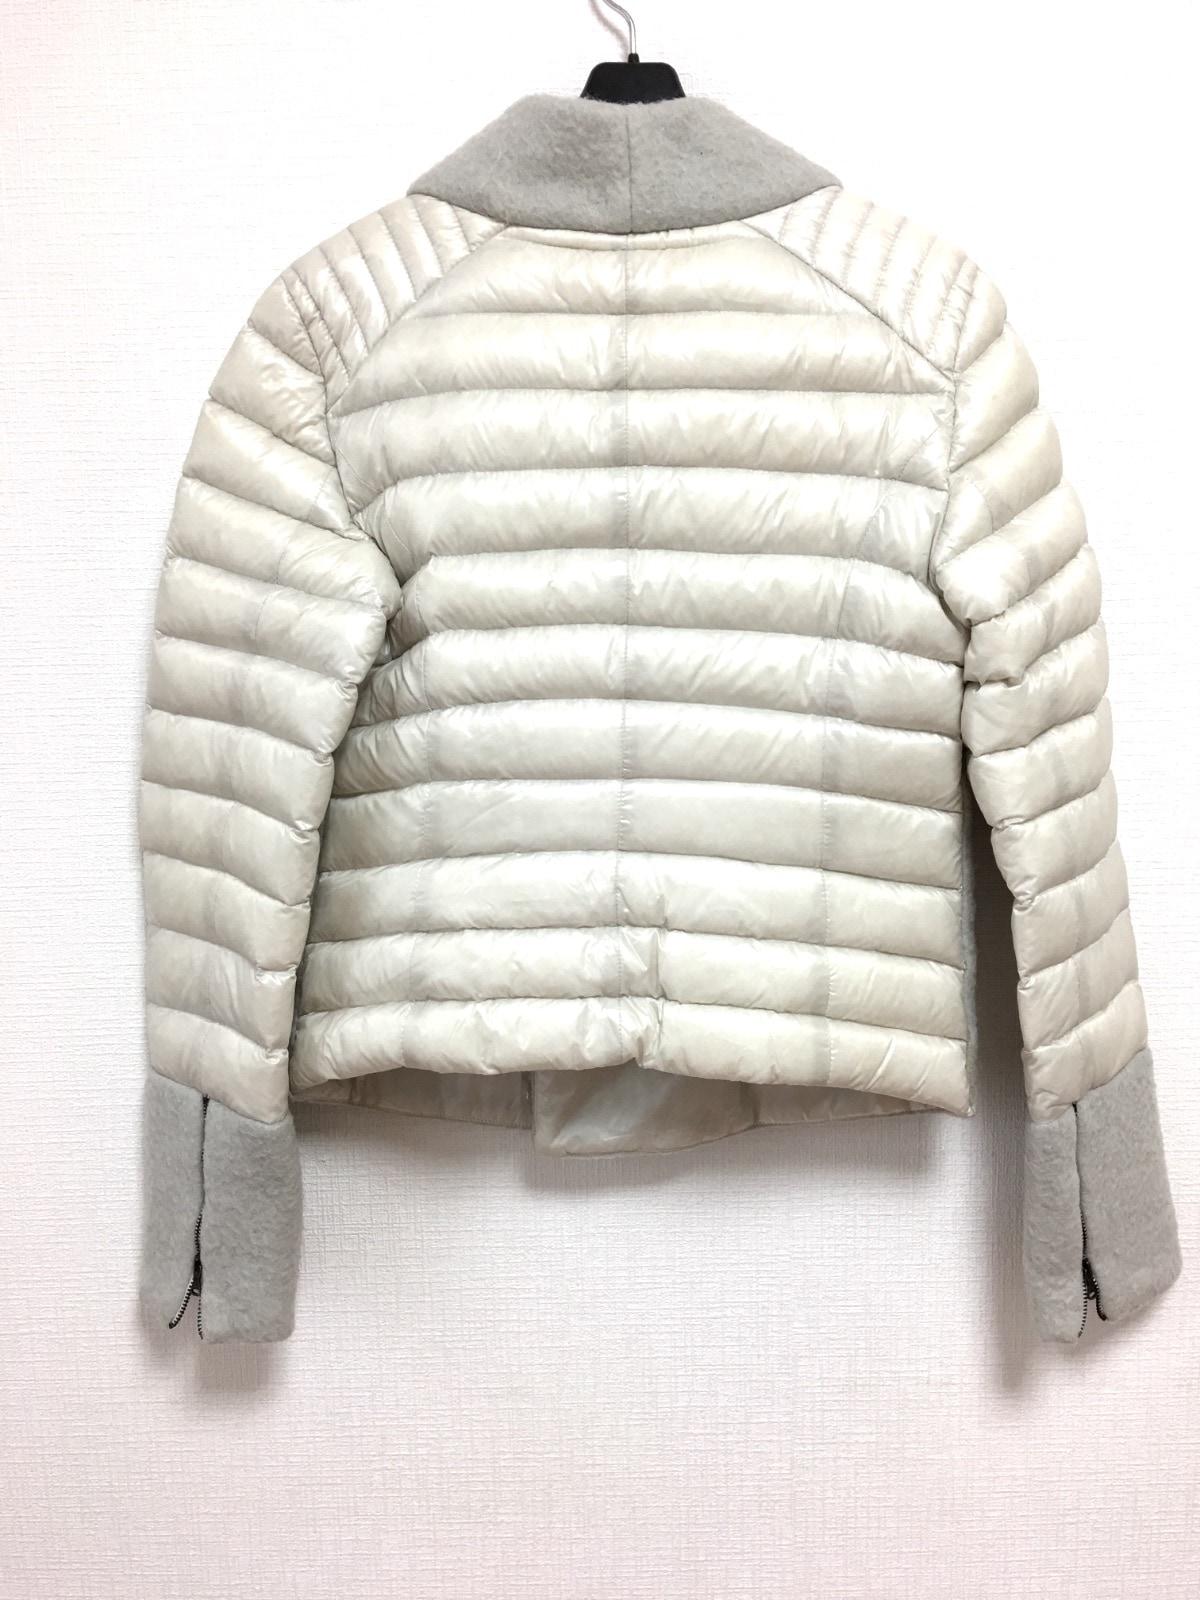 ALYSI(アリジ)のダウンジャケット